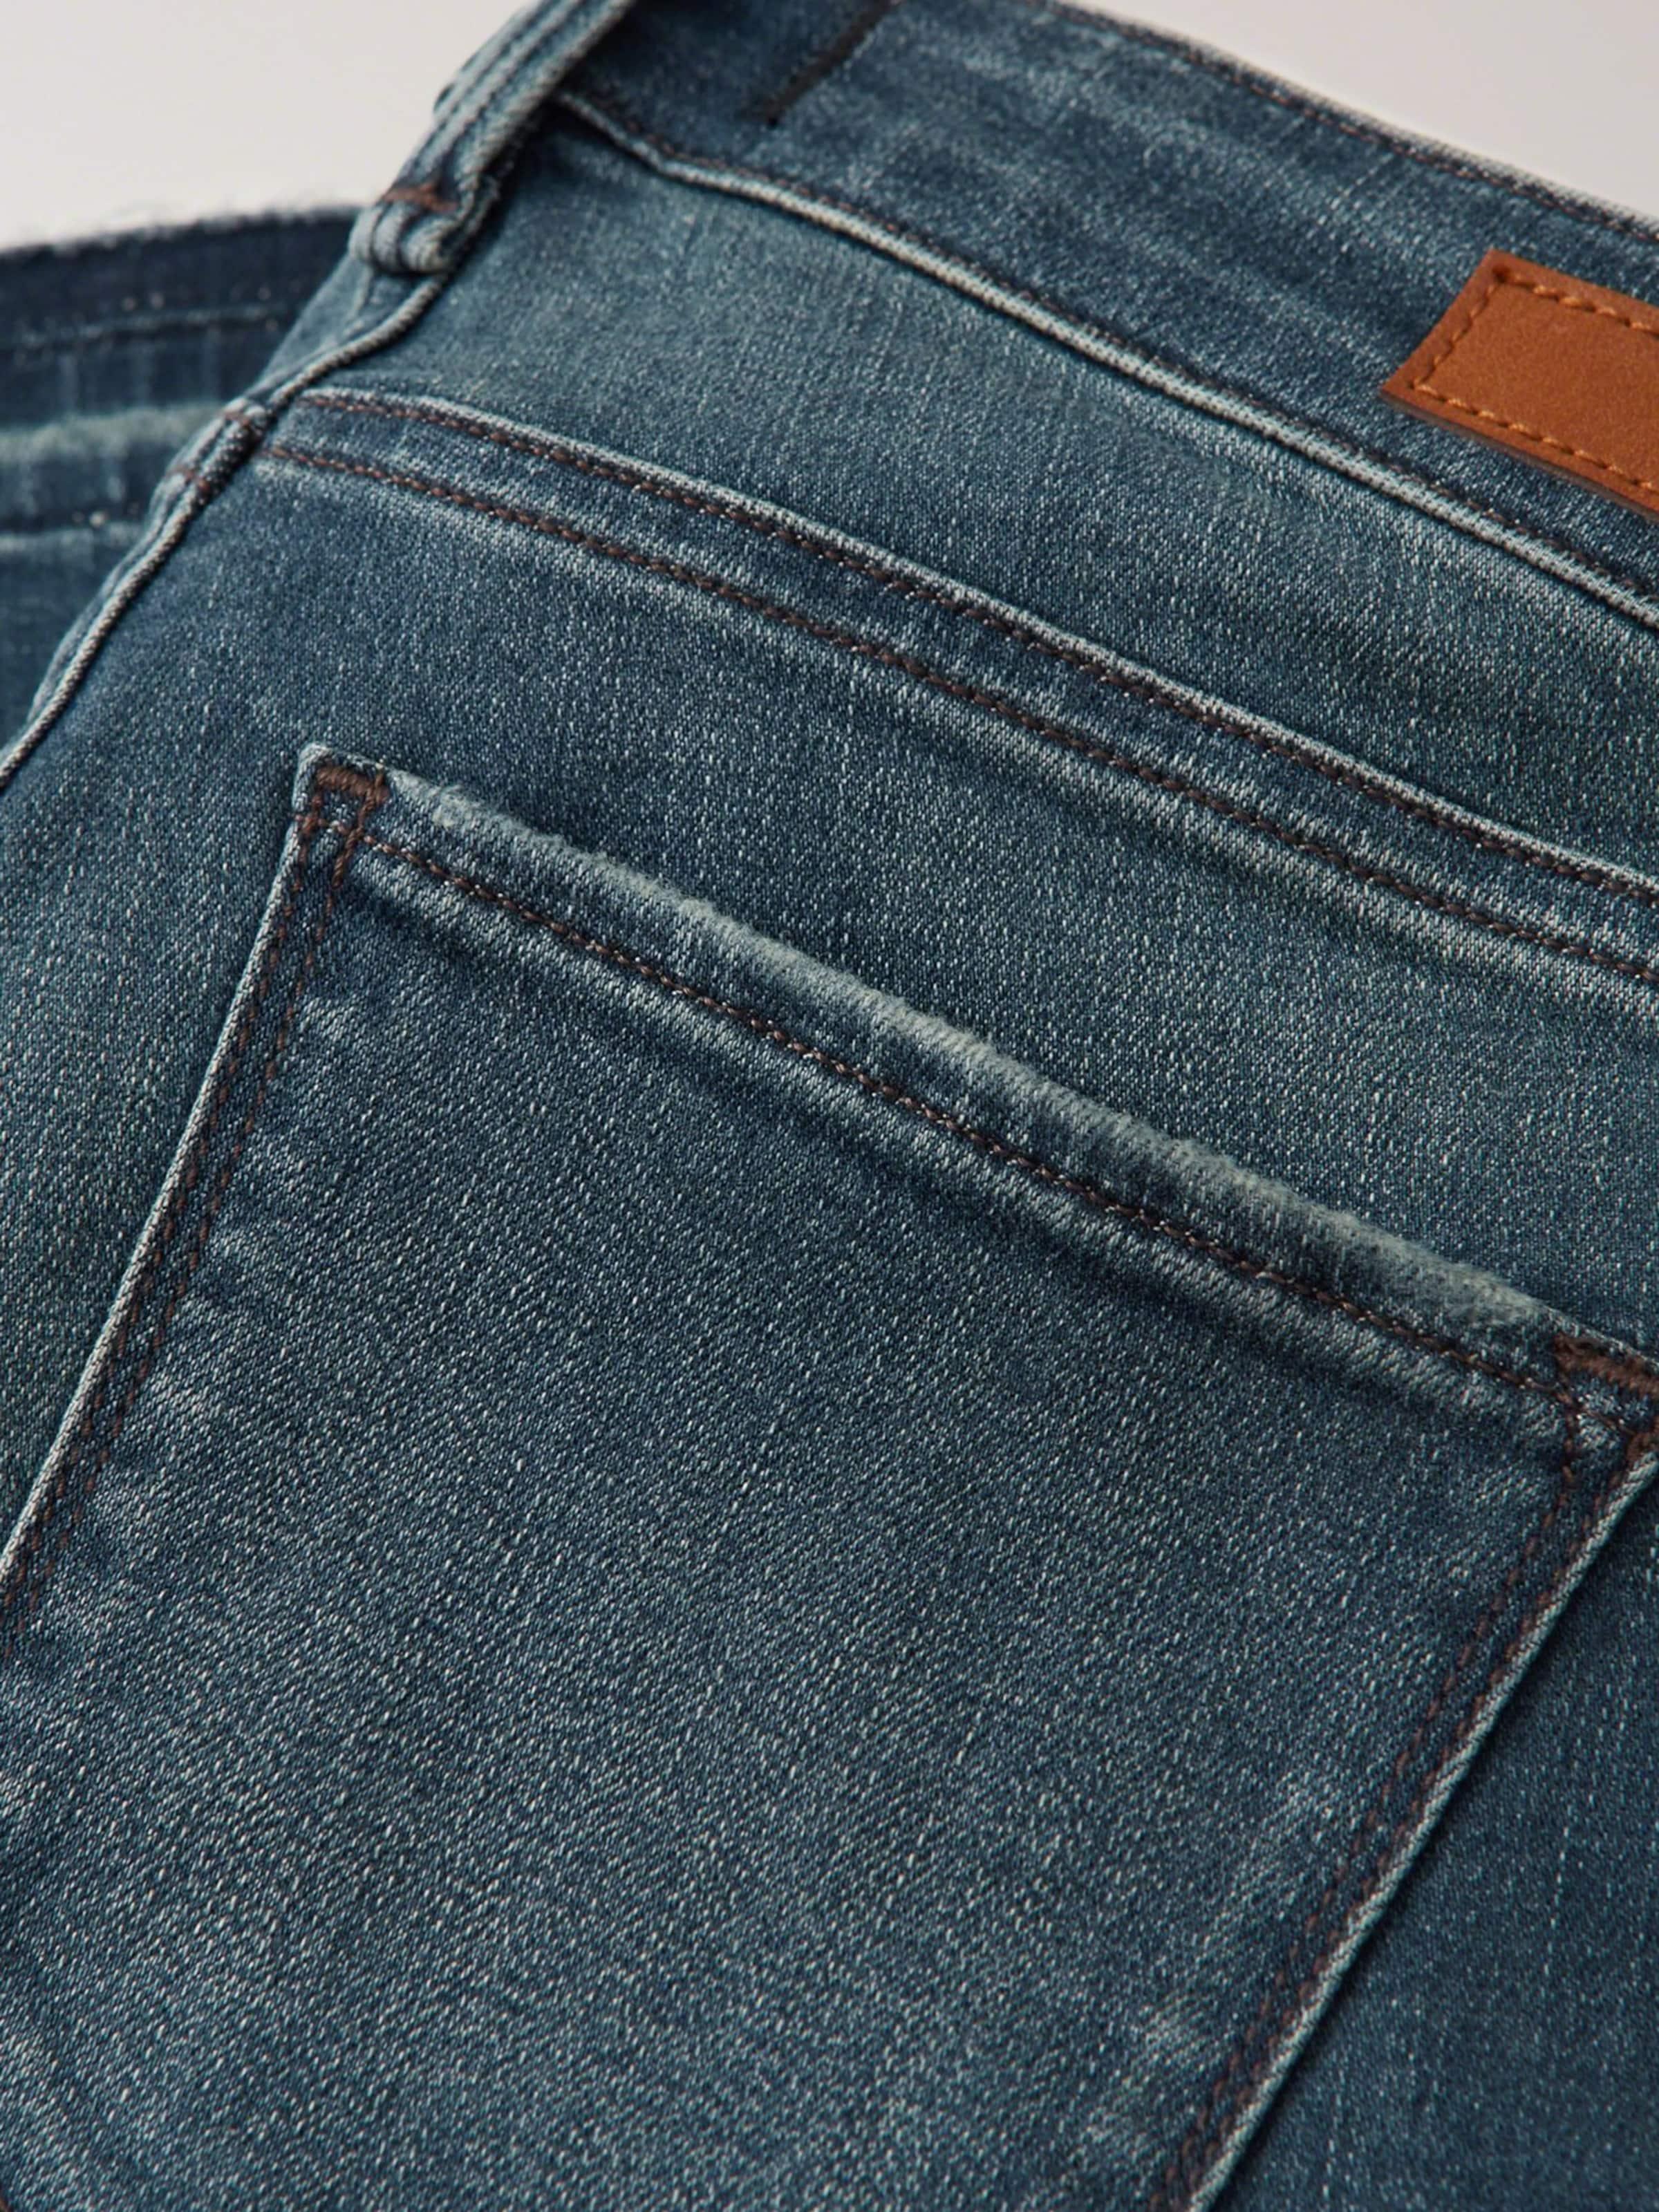 Blue Jeans Fitch Denim In Abercrombieamp; n8w0vNm